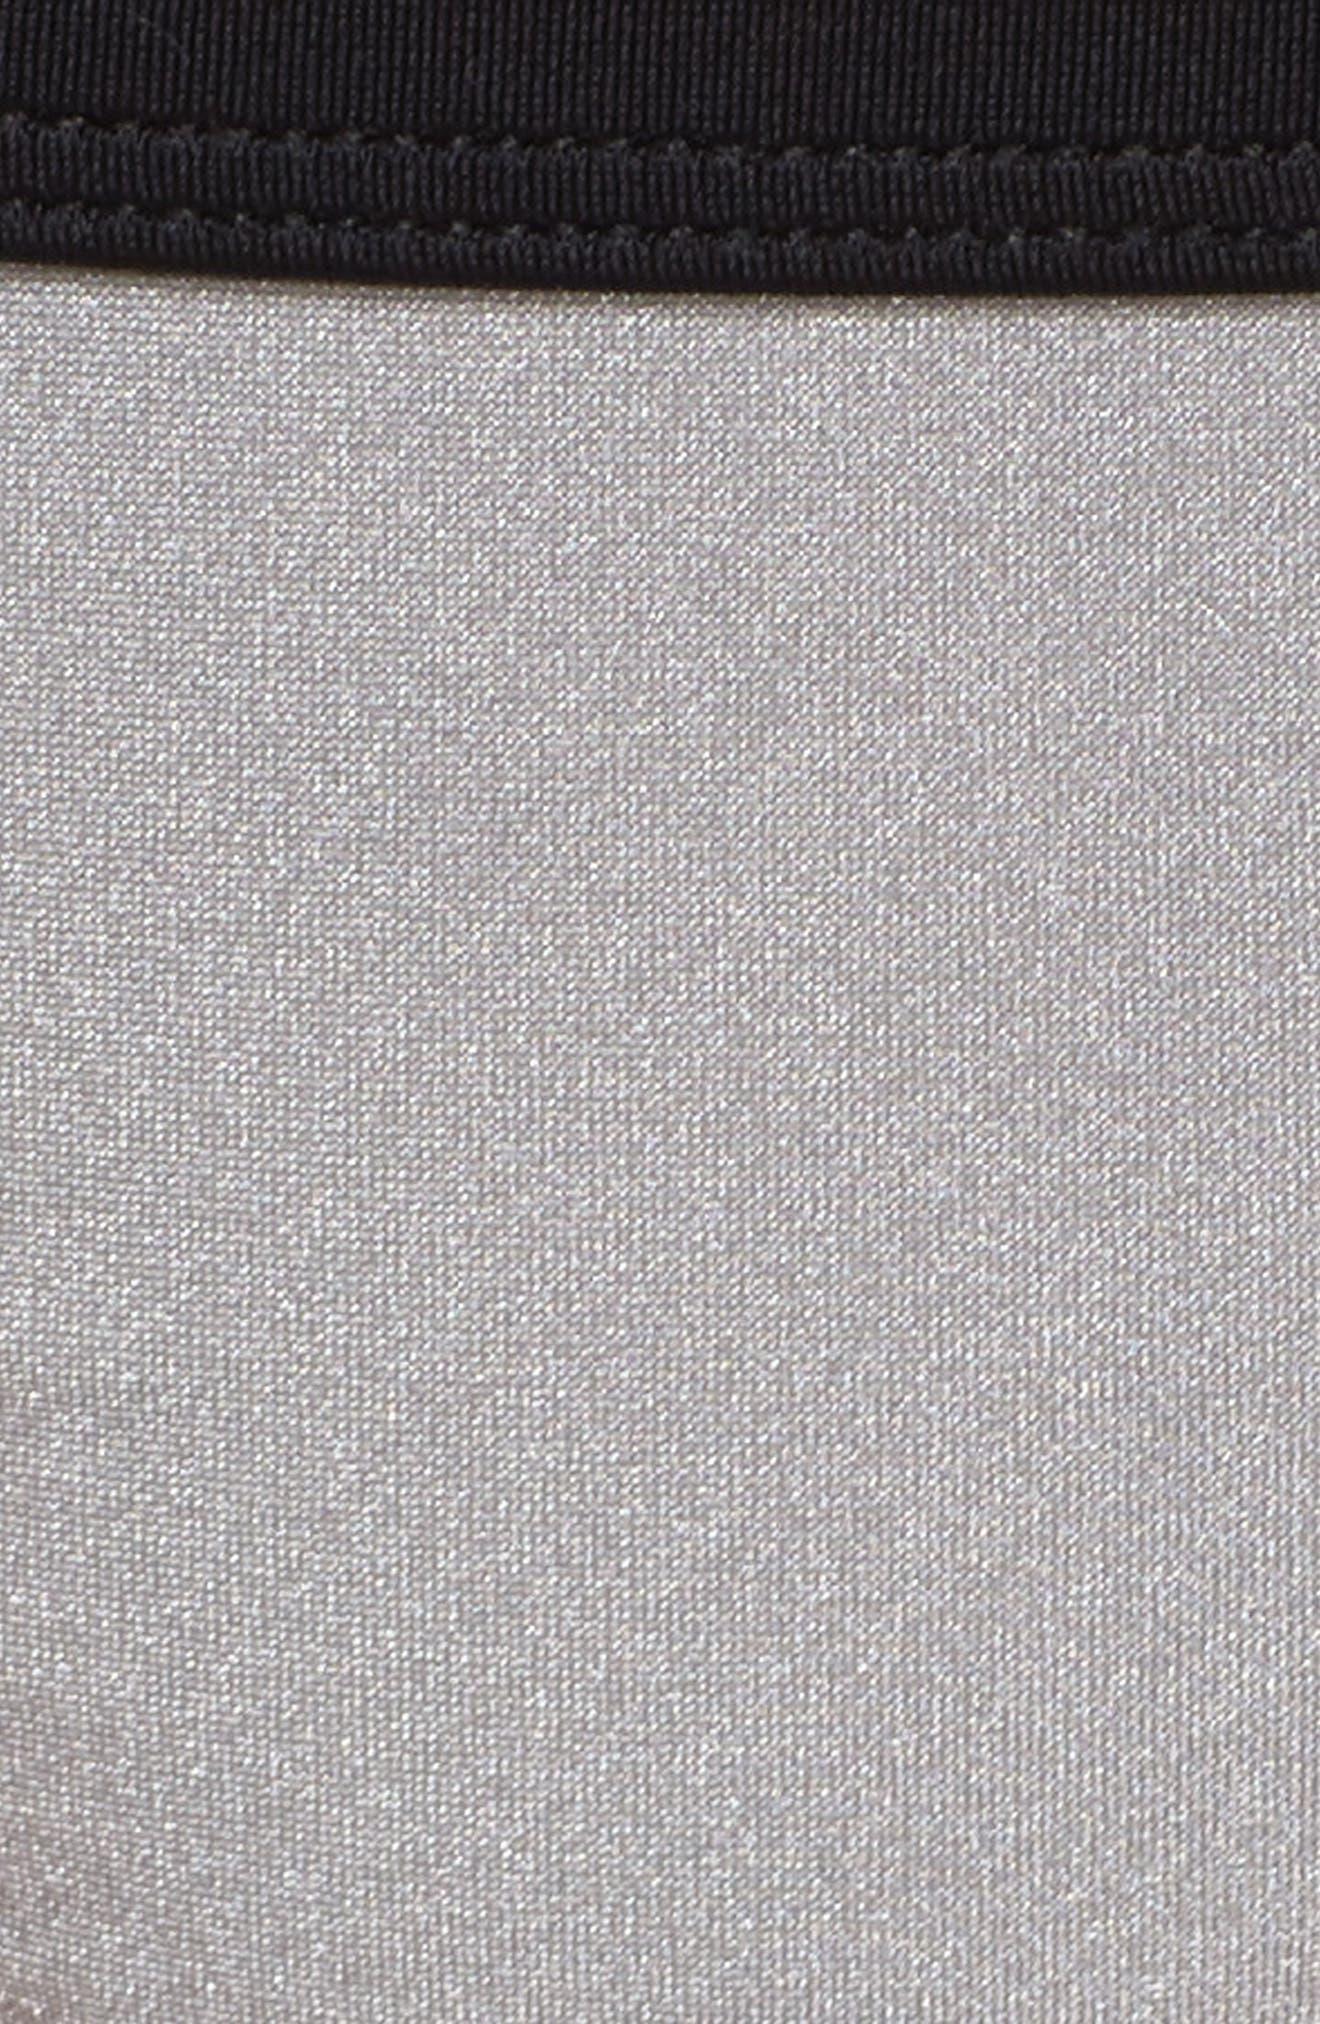 Seaway Fiji Bikini Bottoms,                             Alternate thumbnail 6, color,                             Silver